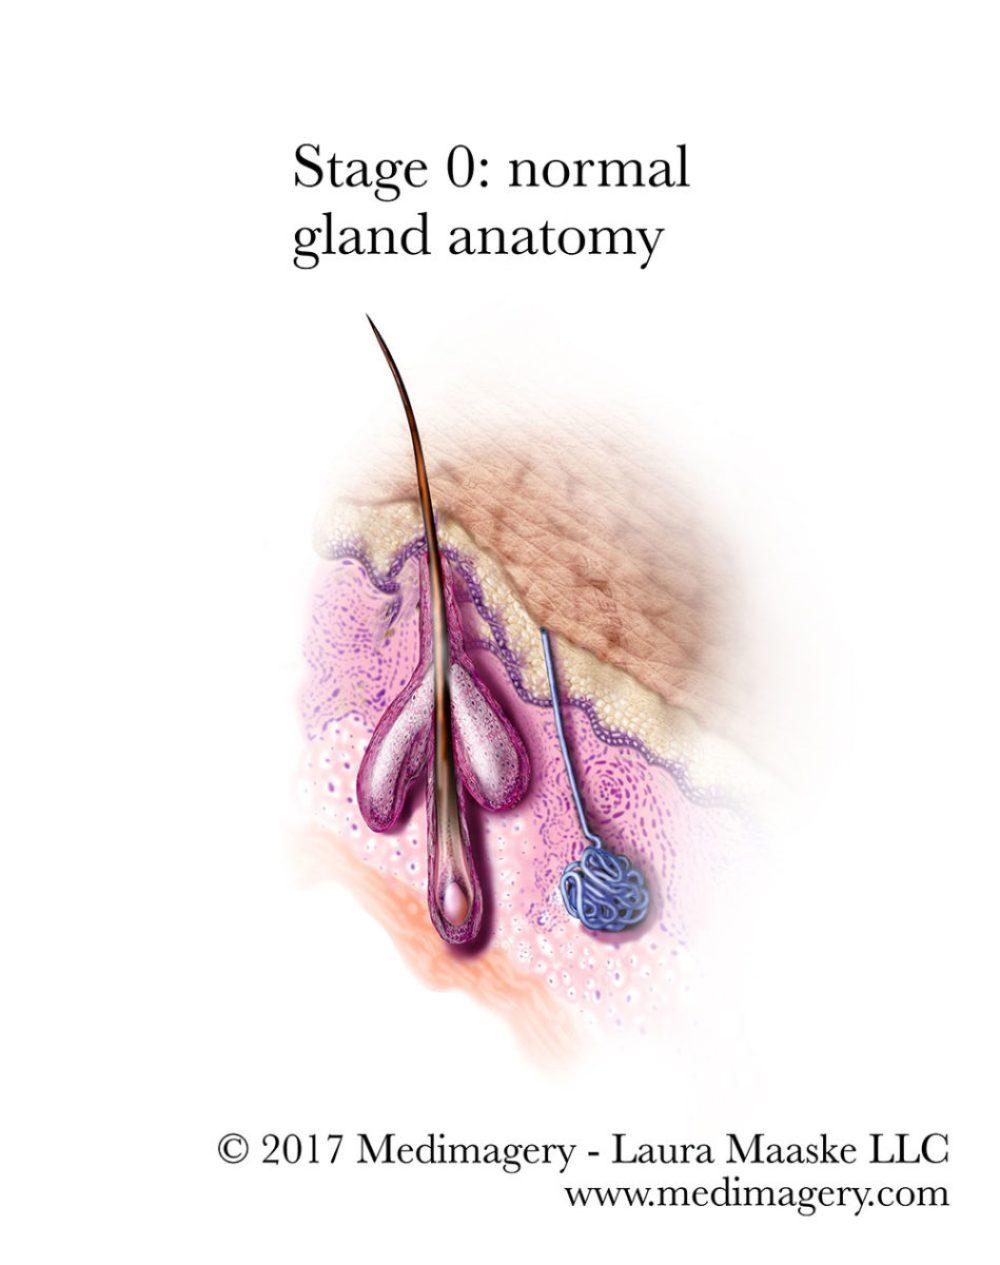 Acne Illustrations Pathology Inflammation Acne Vulgaris Development